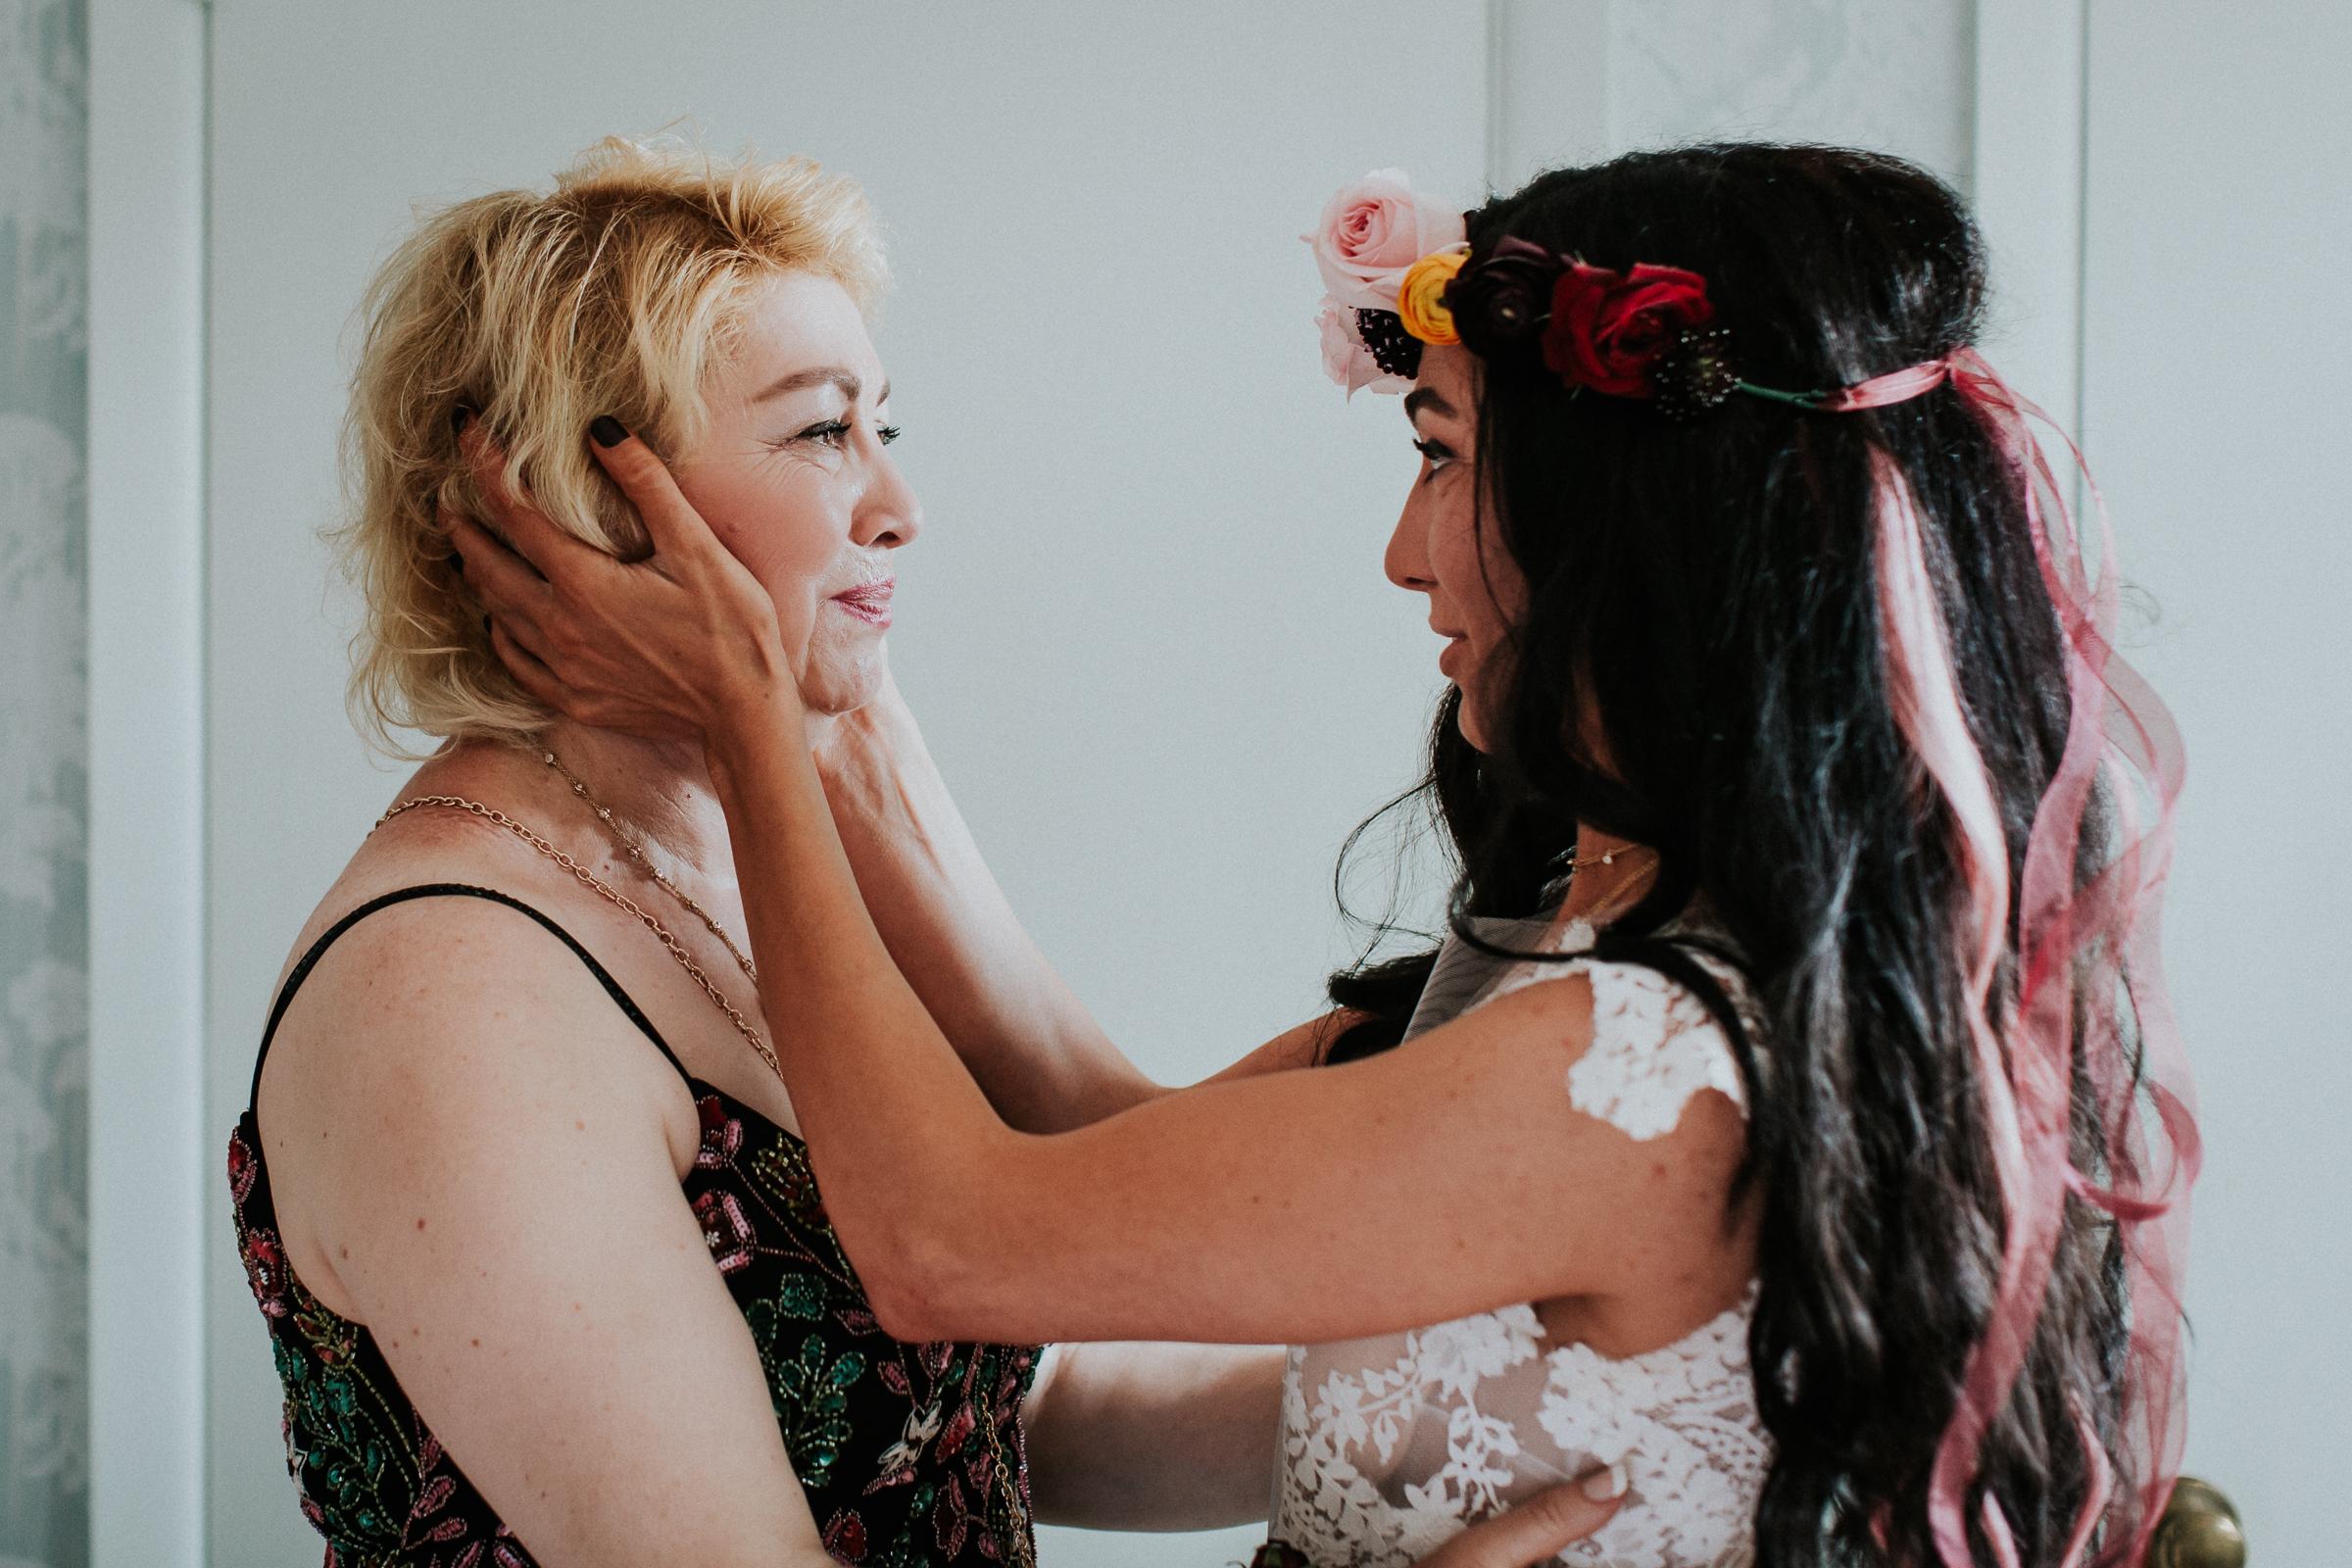 New-York-Documentary-Wedding-Photography-Best-Of-2017-by-Elvira-Kalviste-Photography-60.jpg